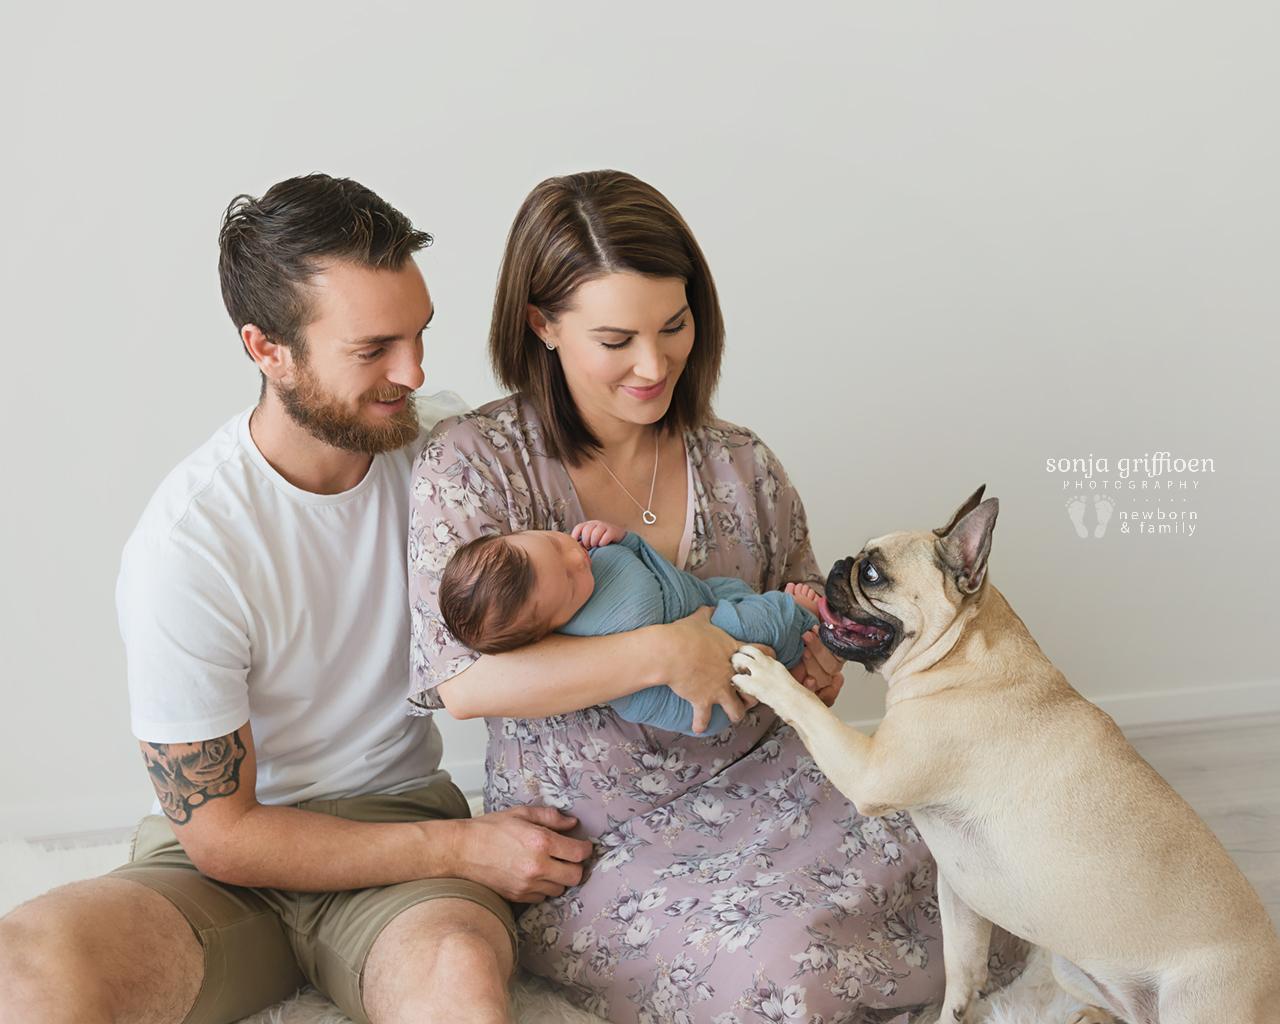 Lennox-Newborn-Brisbane-Newborn-Photographer-Sonja-Griffioen-02.jpg